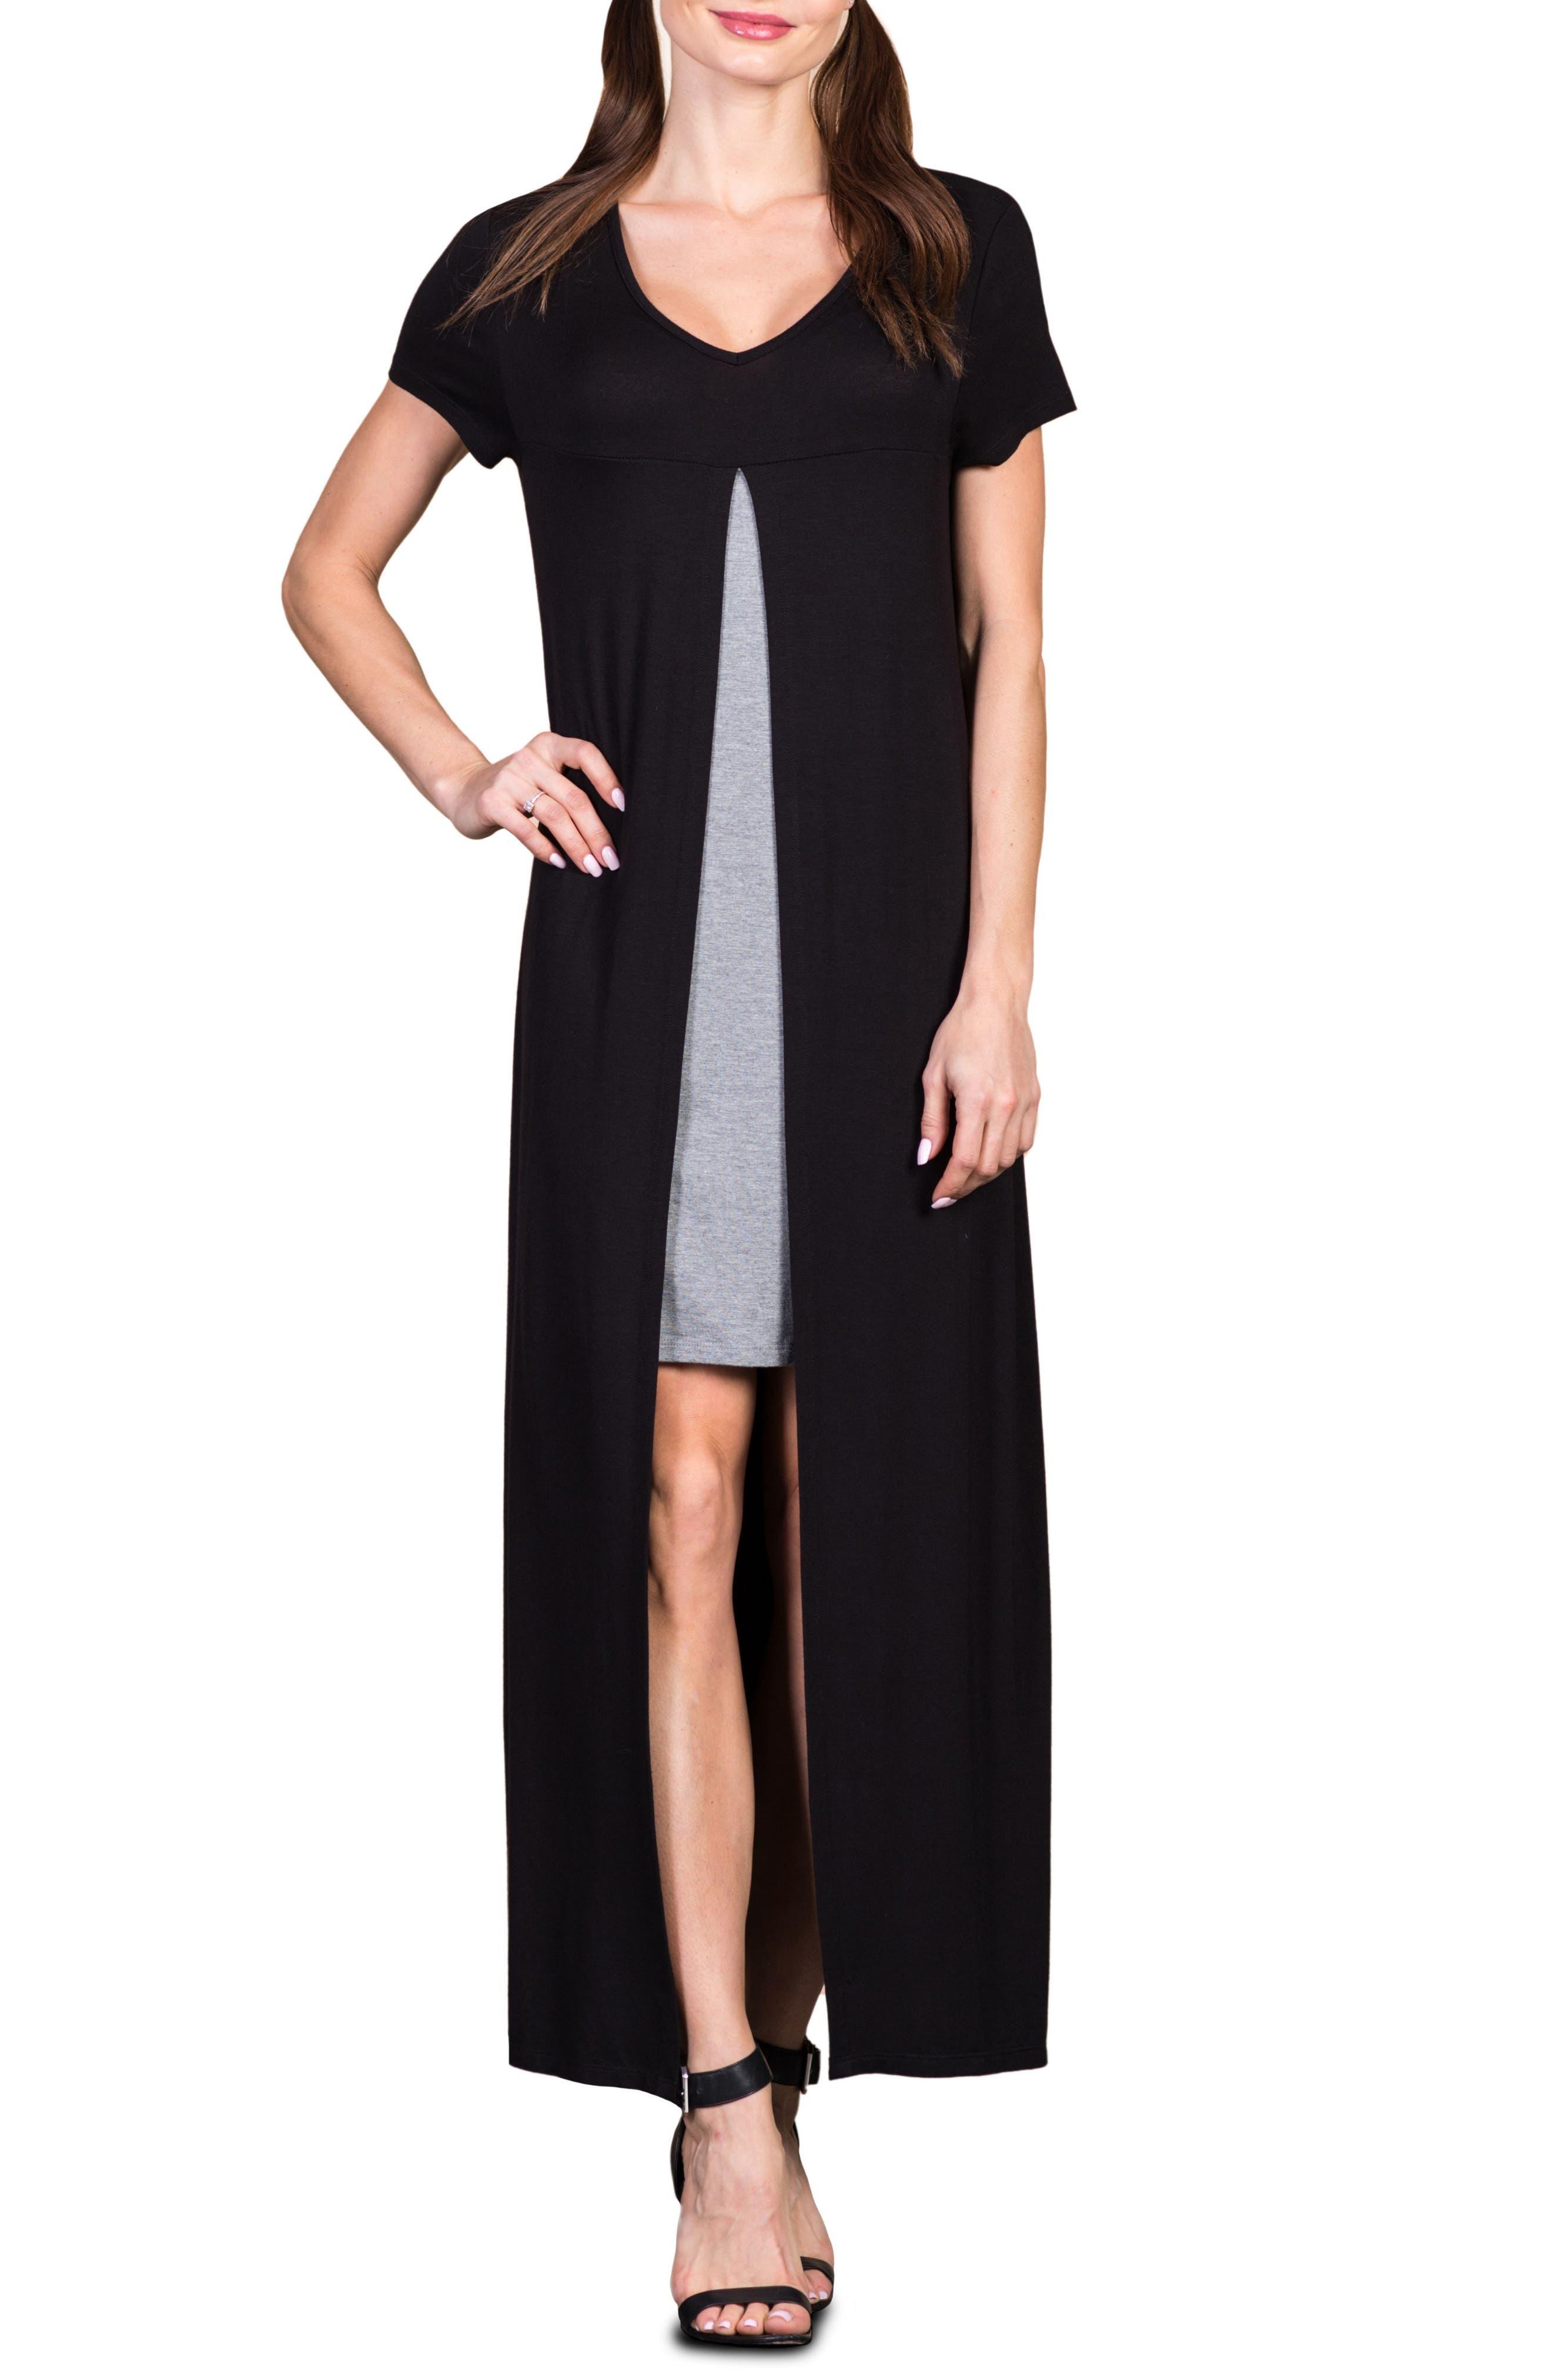 Savi Mom Milan Maternity/nursing Maxi Dress, Black